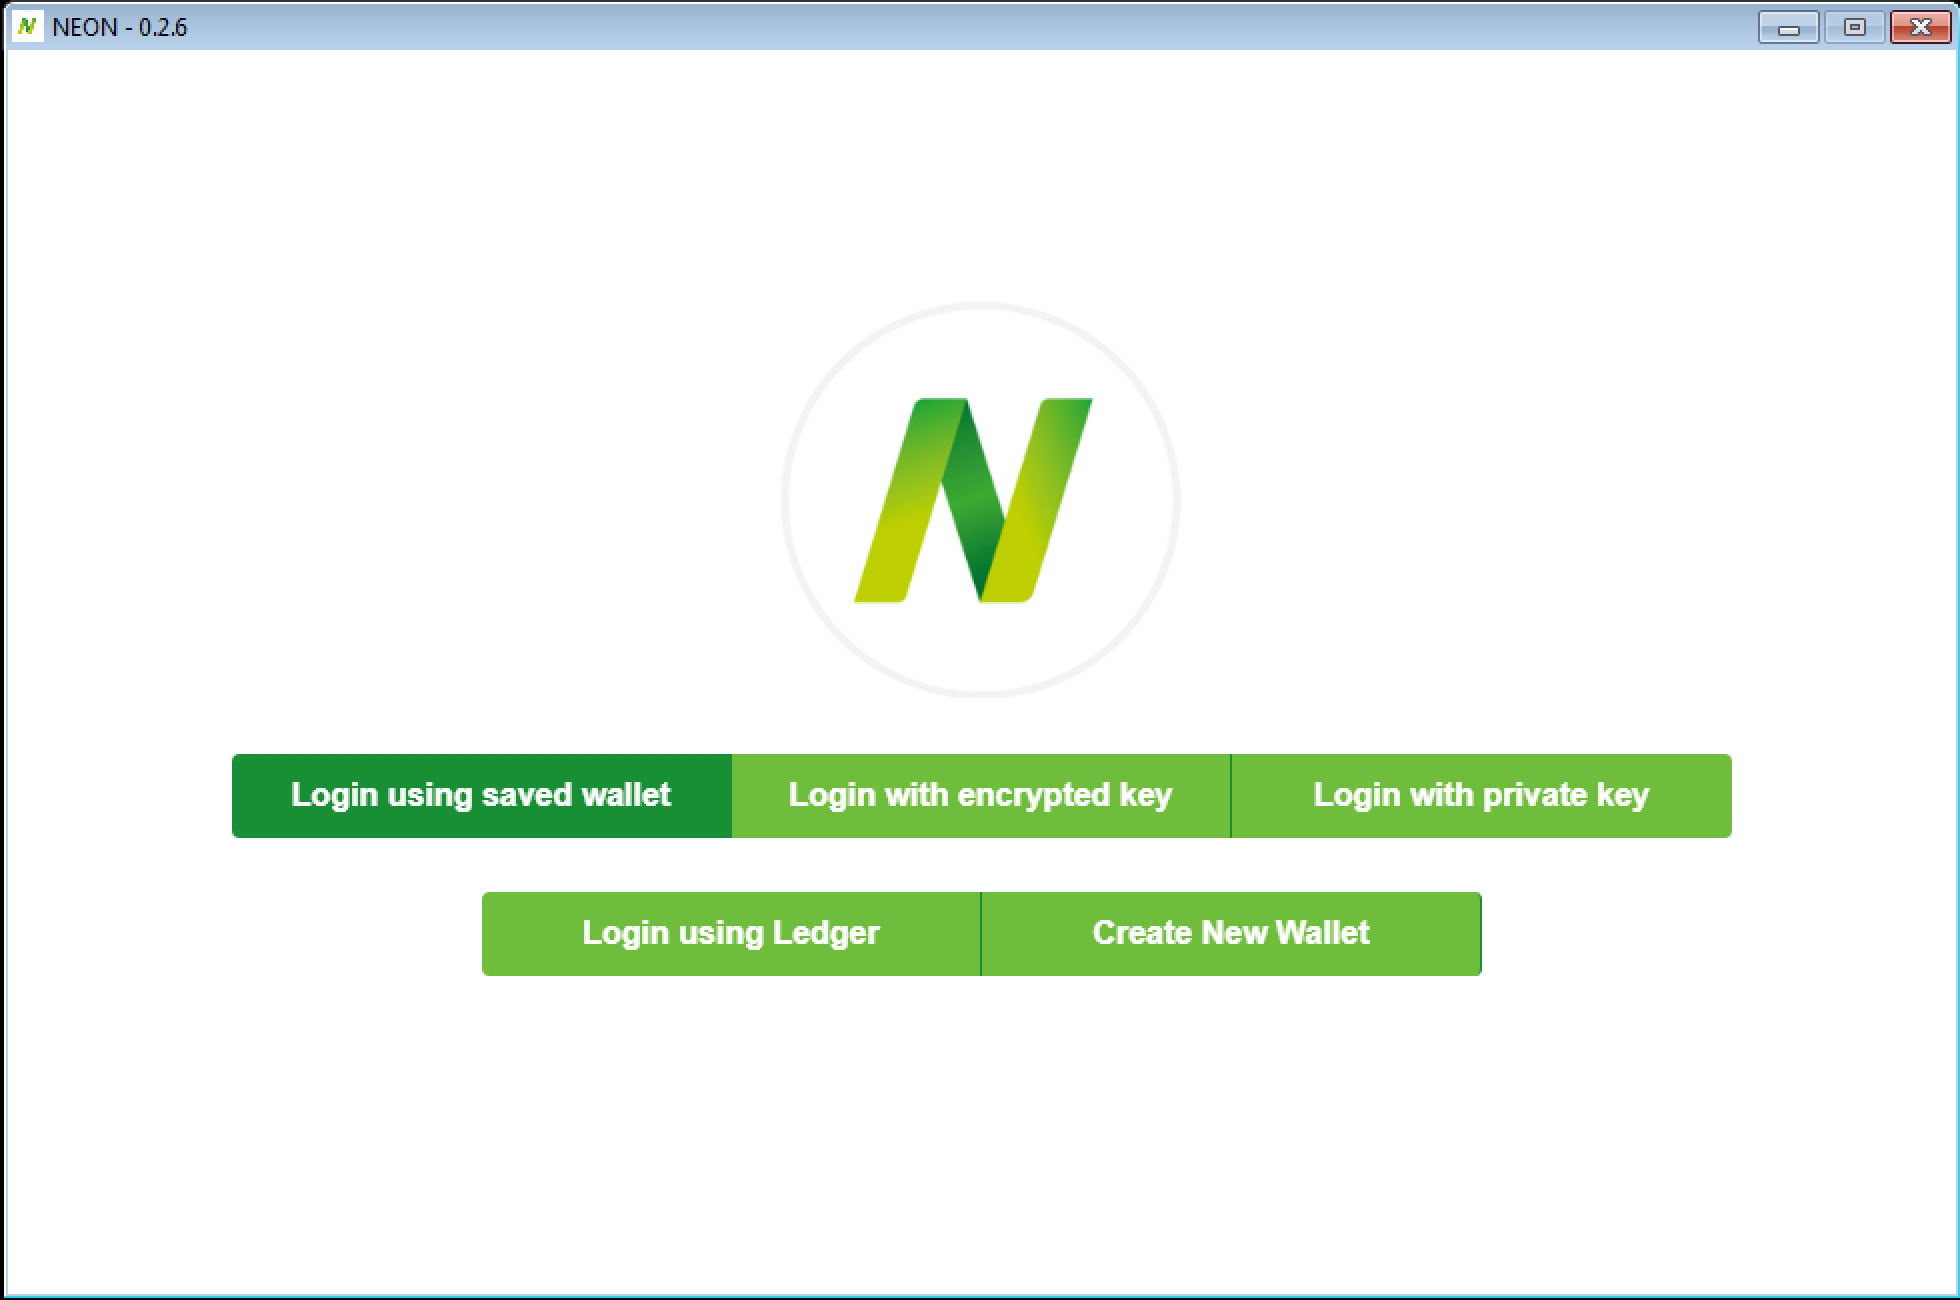 Homograph Github Domain spreads Neon Wallet Trojan | Prof